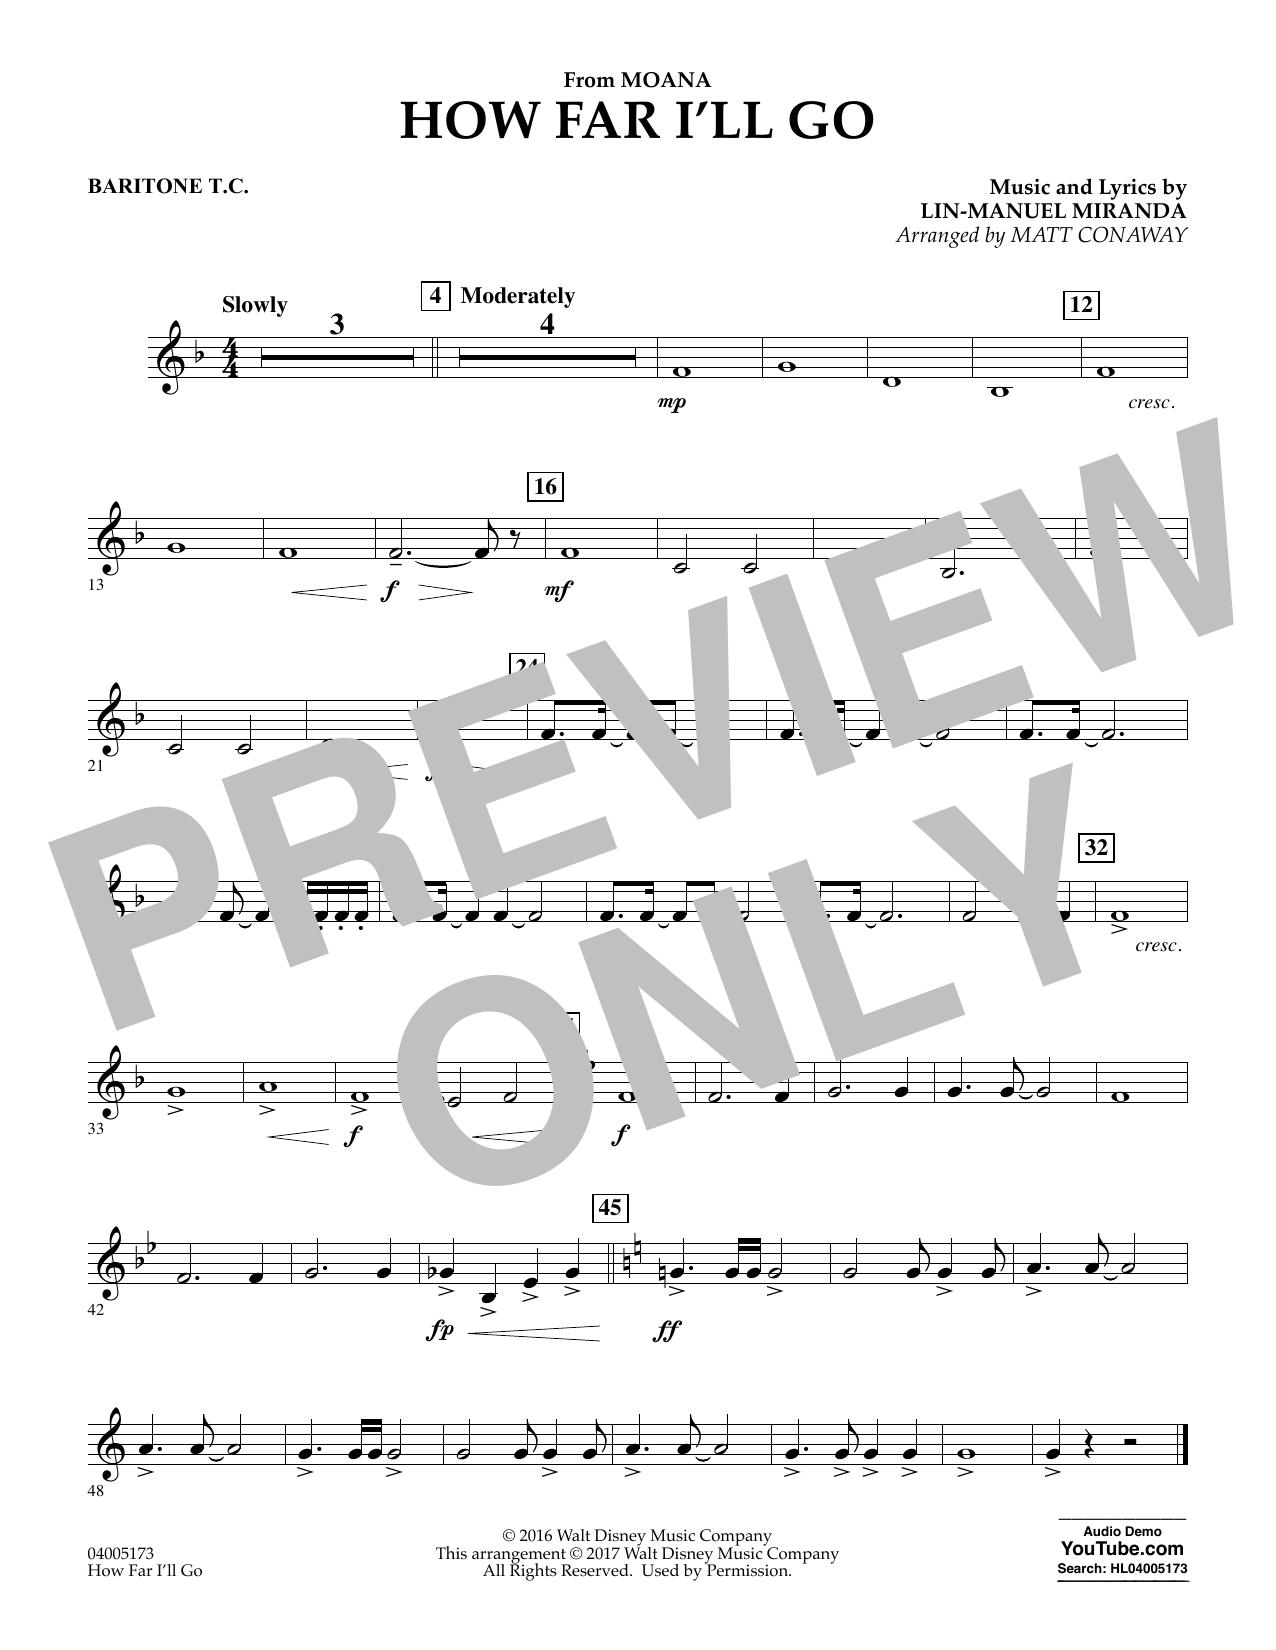 How Far I'll Go (from Moana) - Baritone T.C. (Concert Band)